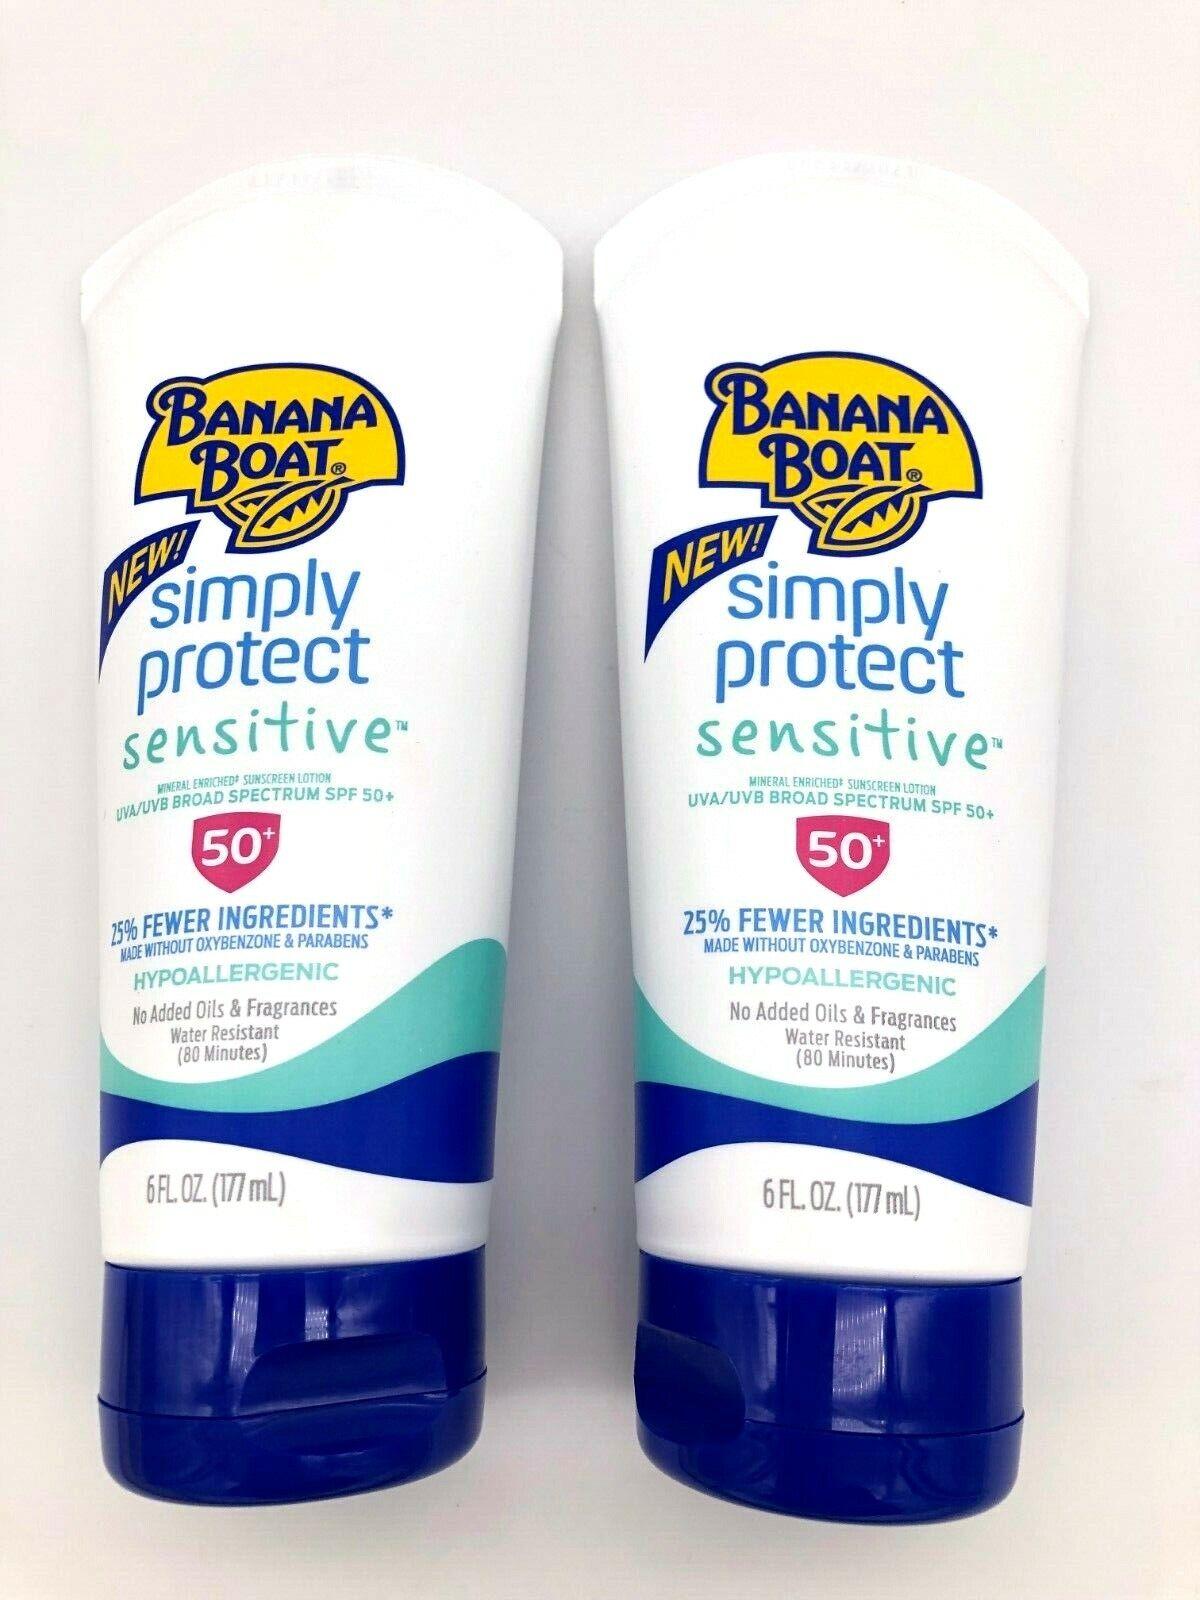 Banana Boat Simply Protect Sensitive Sunscreen Lotion Spf 50